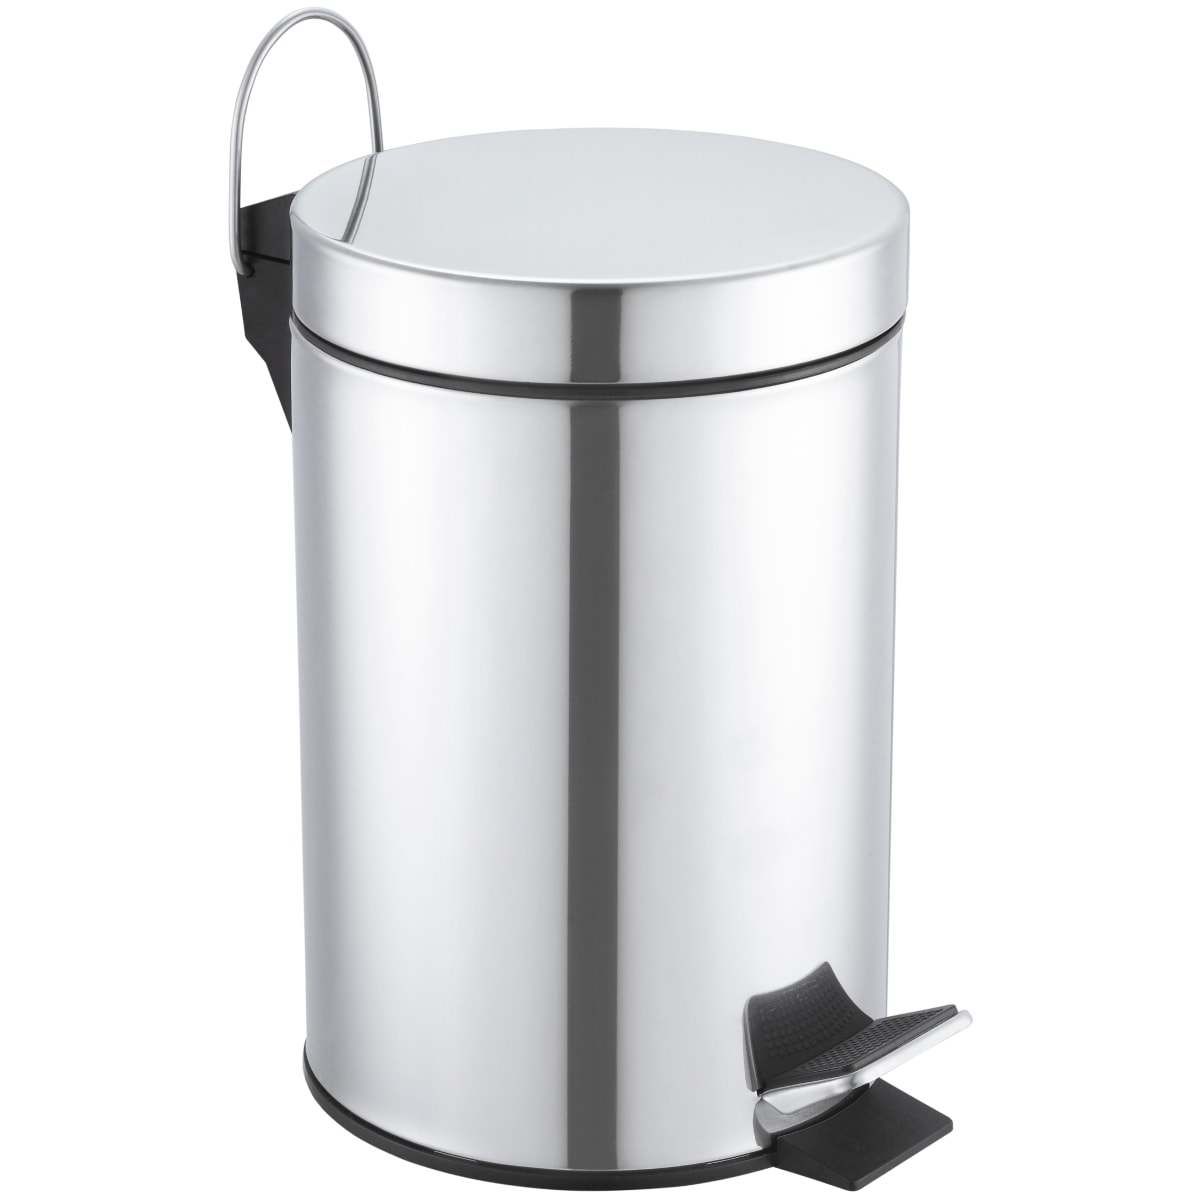 Бак для мусора Sensea 3 л цвет хром